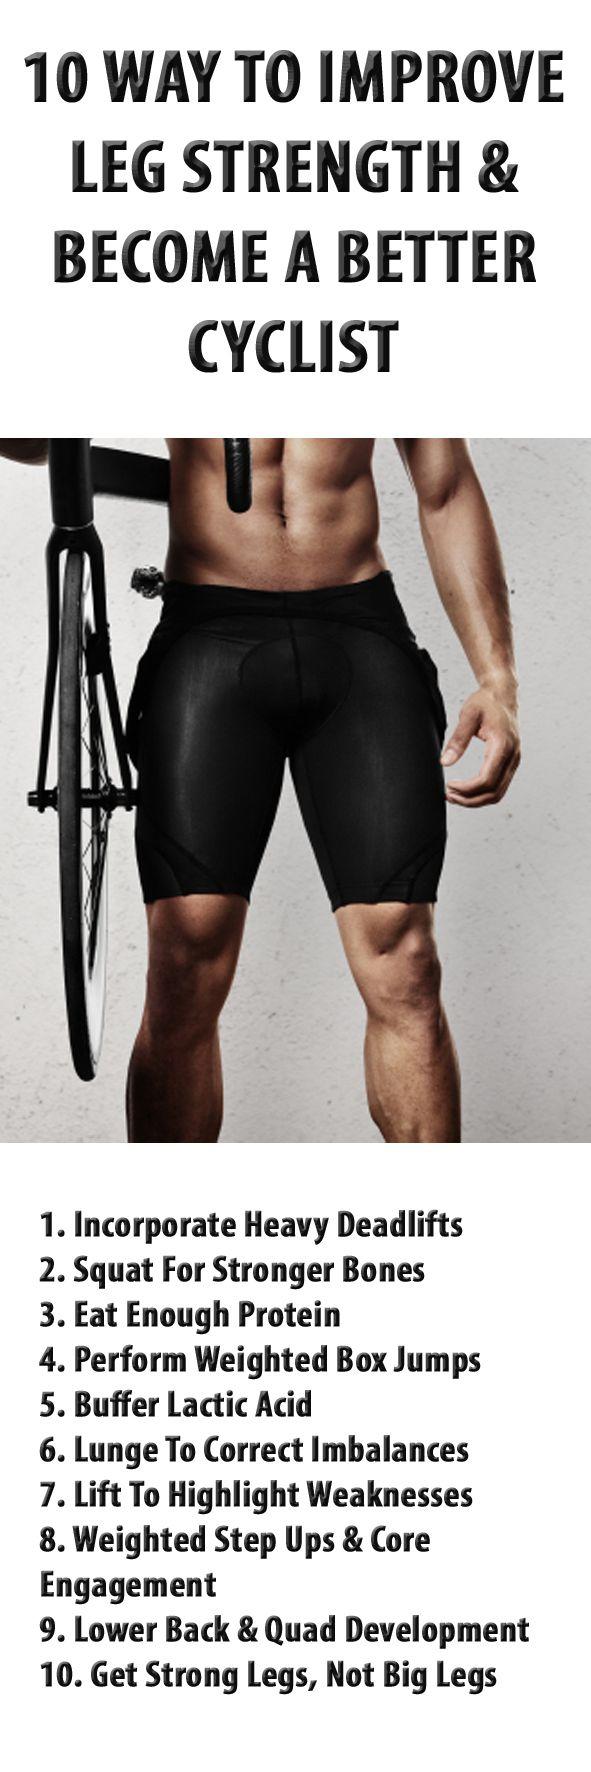 e3d1b840b4ec 10 ways to improve leg strength in general